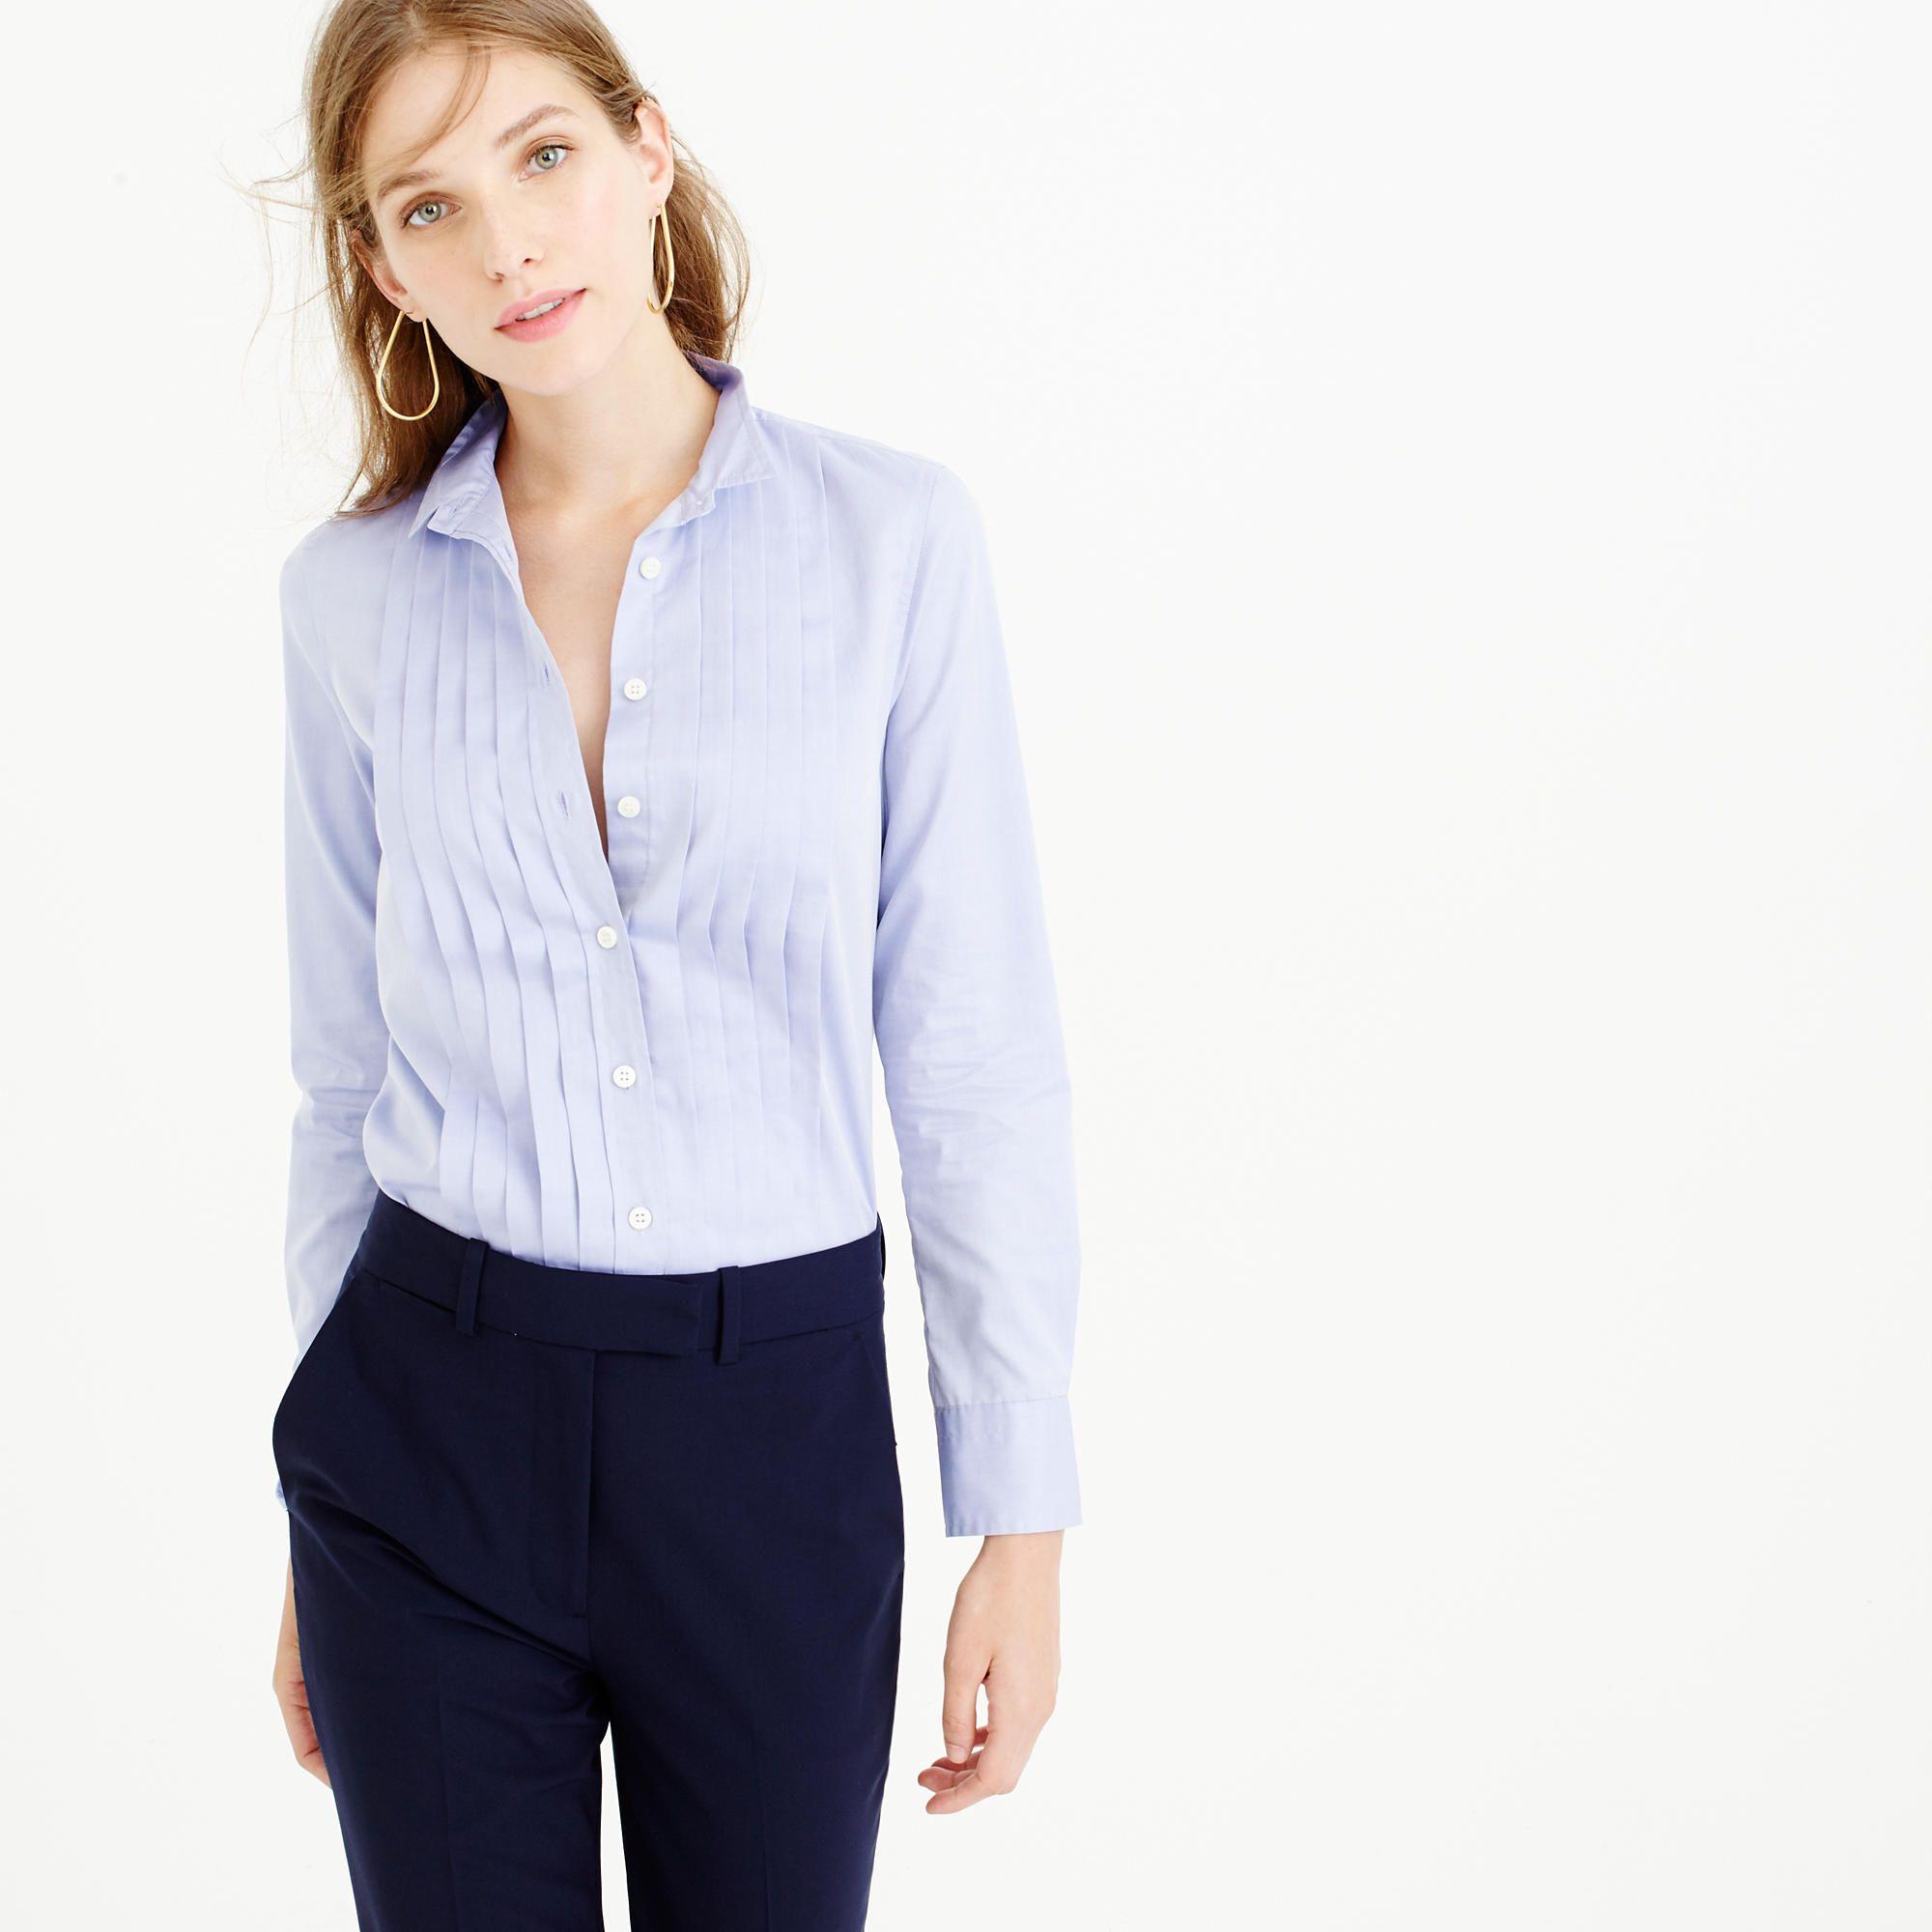 Thomas Mason® for J.Crew tuxedo shirt in blue  09a6616da